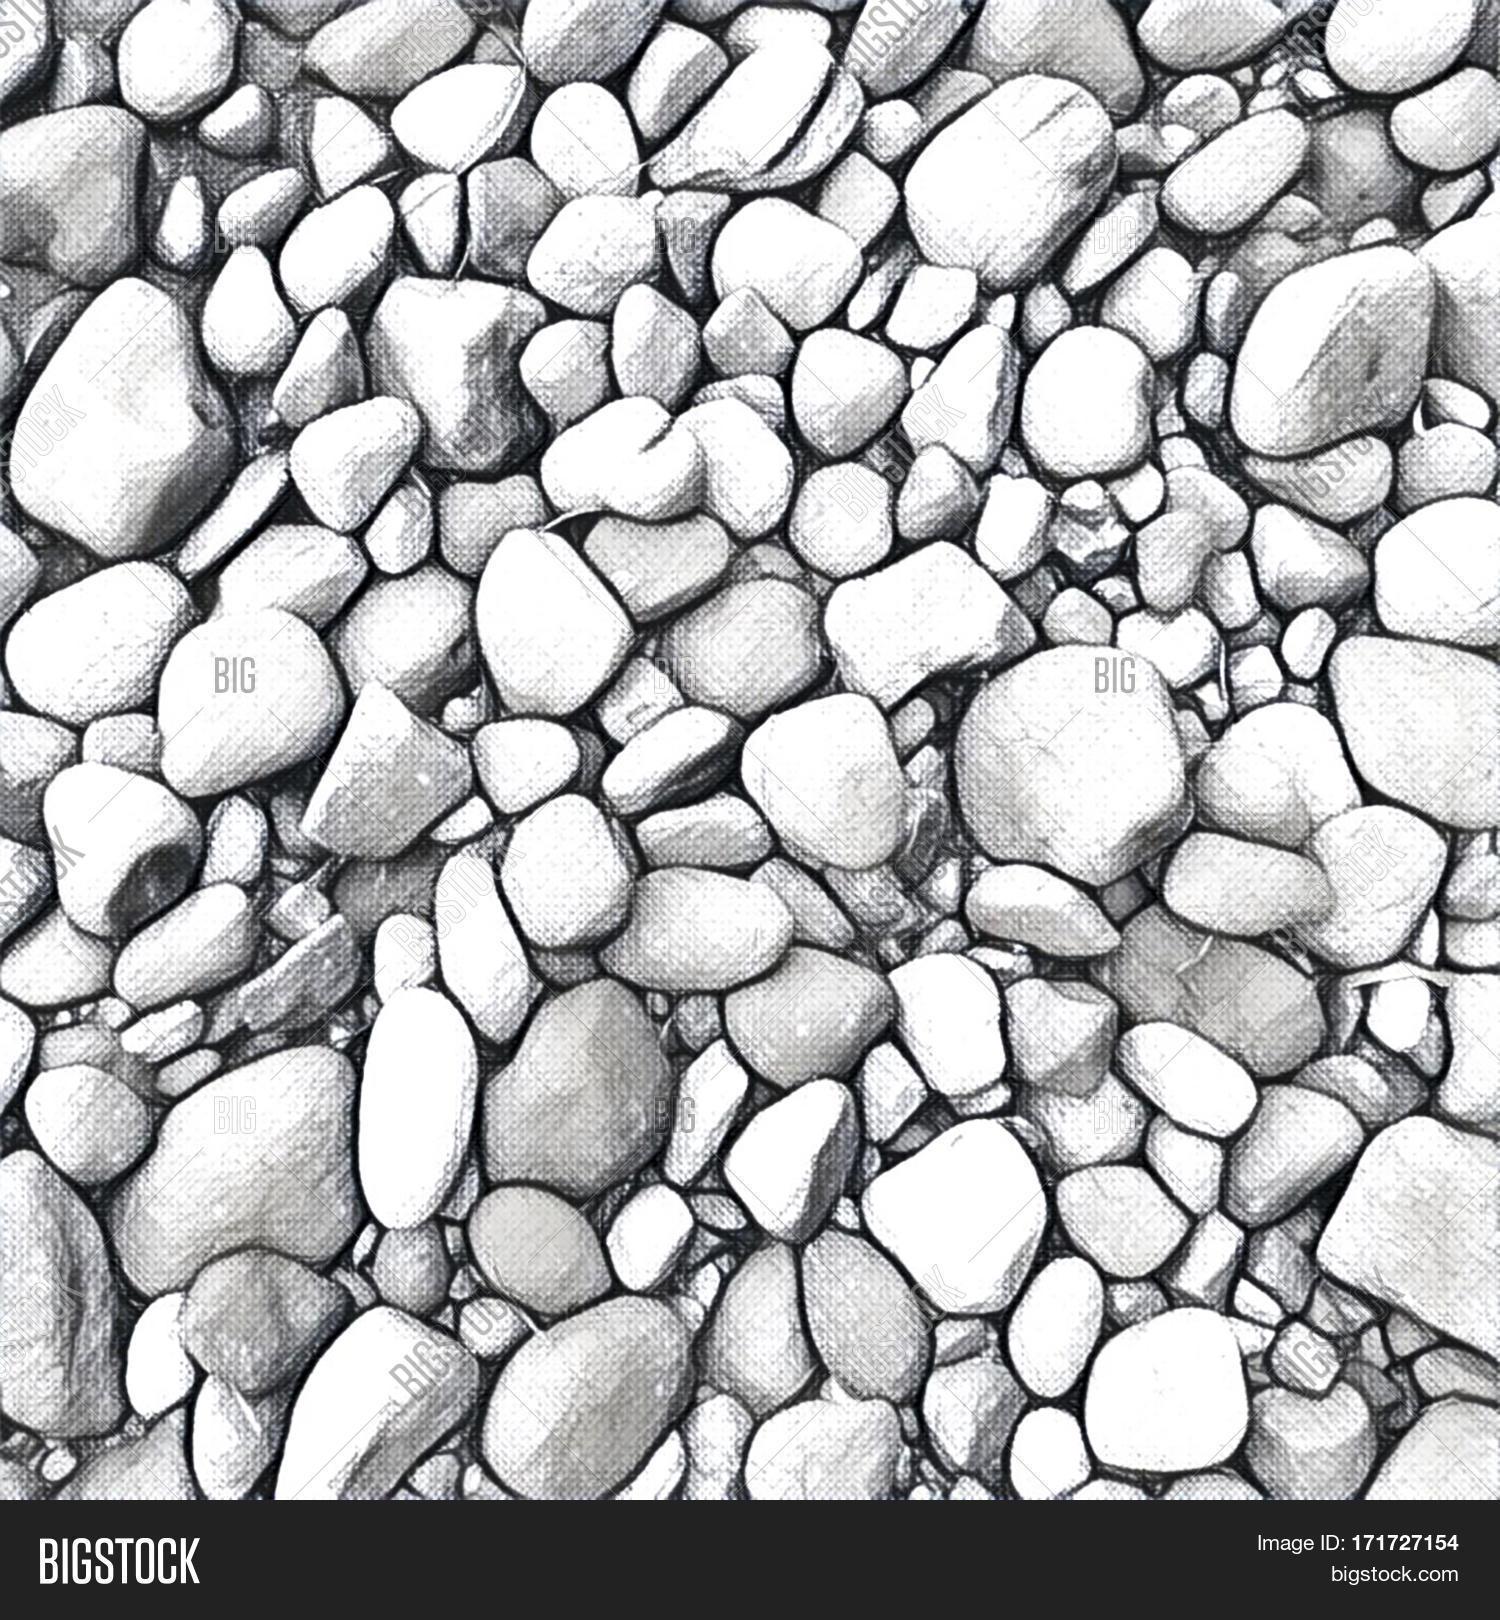 1500x1620 Stone Background Digital Image Amp Photo Bigstock